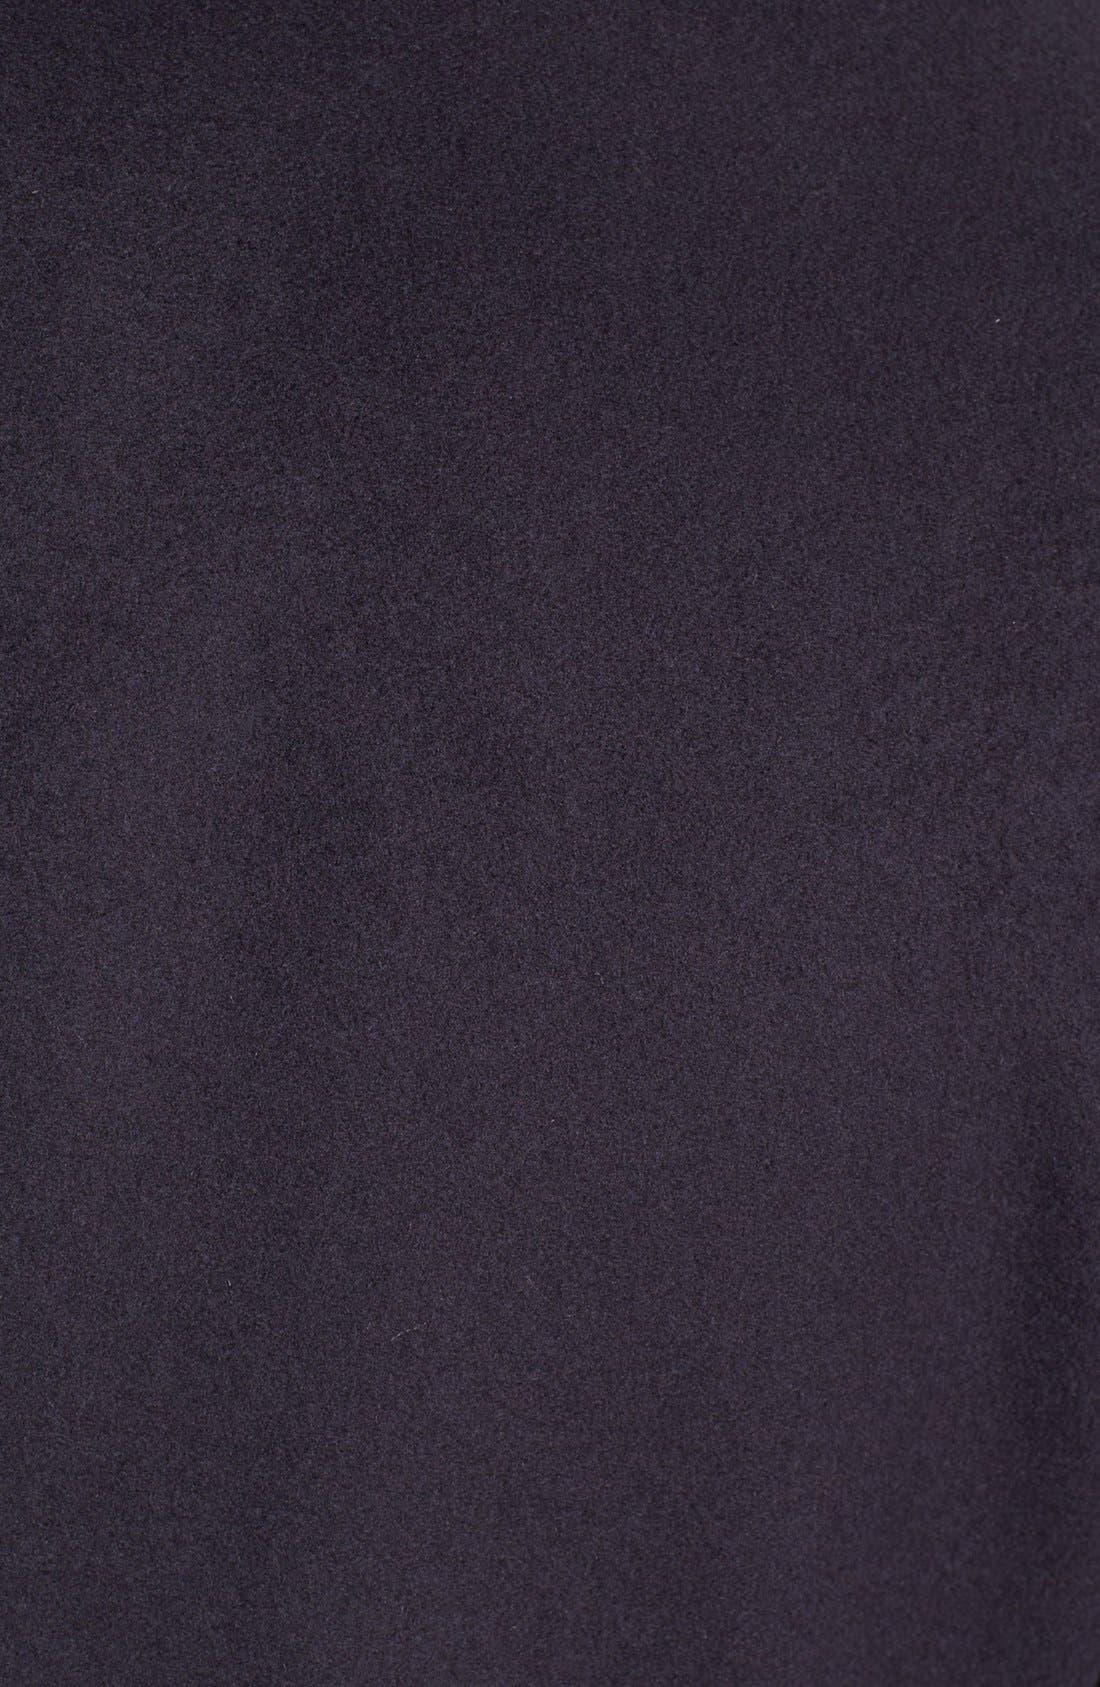 Alternate Image 3  - Armani Collezioni Wool Blend Peacoat